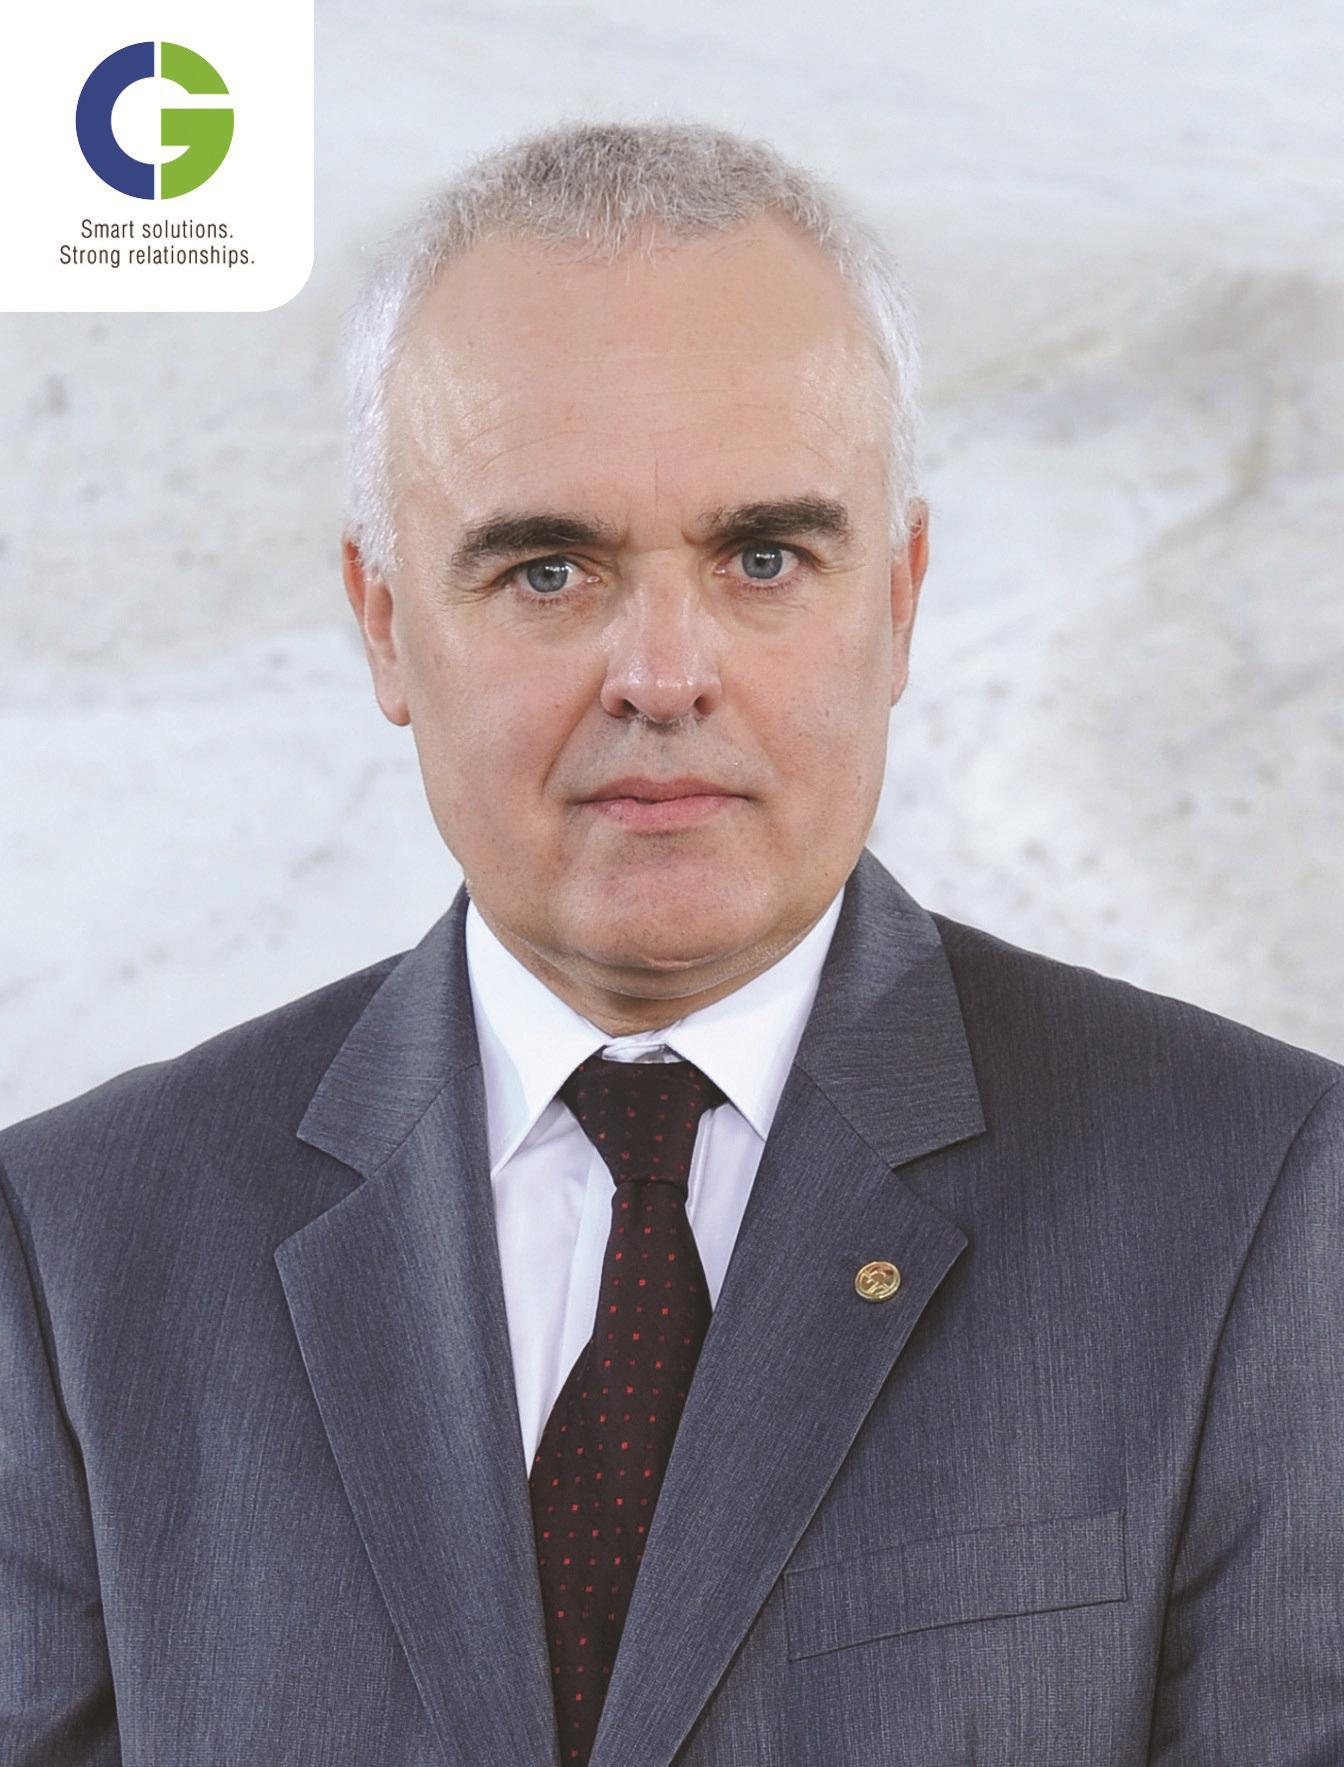 Mr. Laurent Demortier, CEO and Managing Director of CG